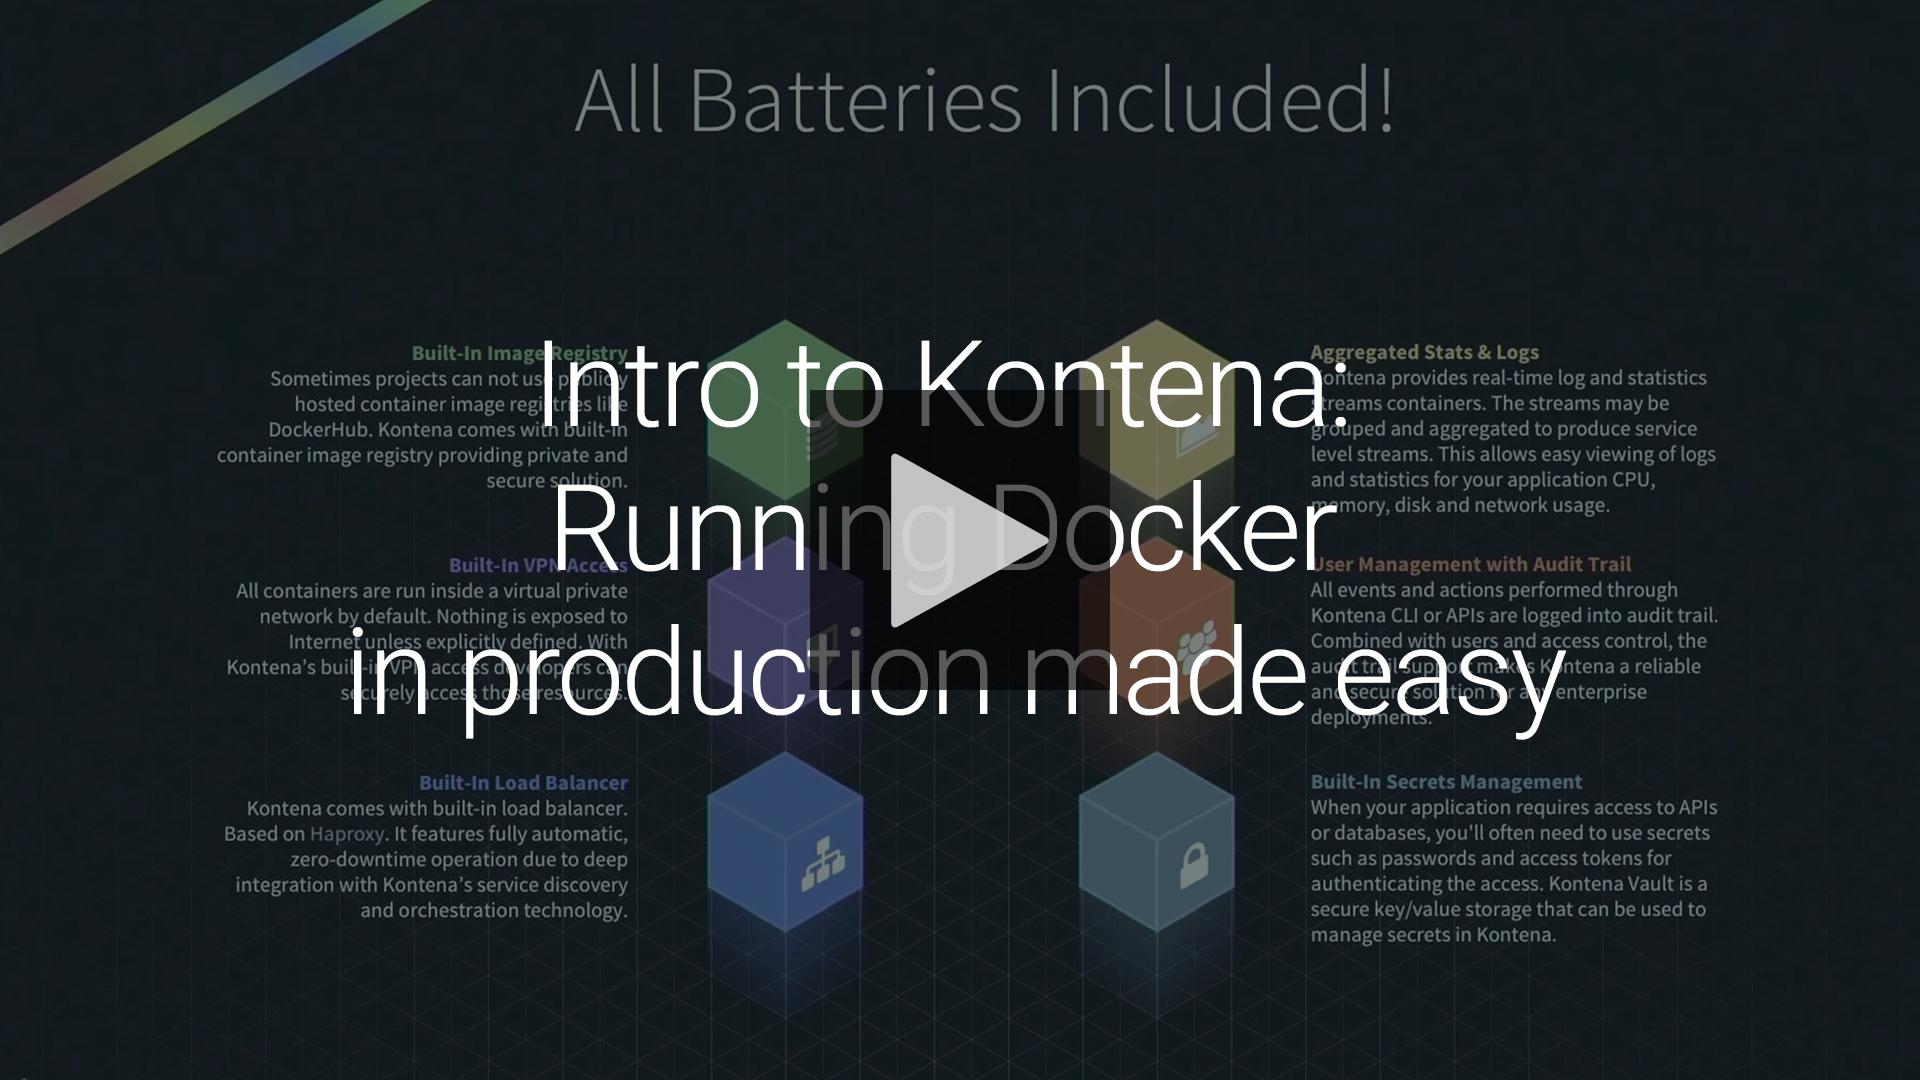 Kontena | Tutorial Video: Intro to Kontena: Running Docker